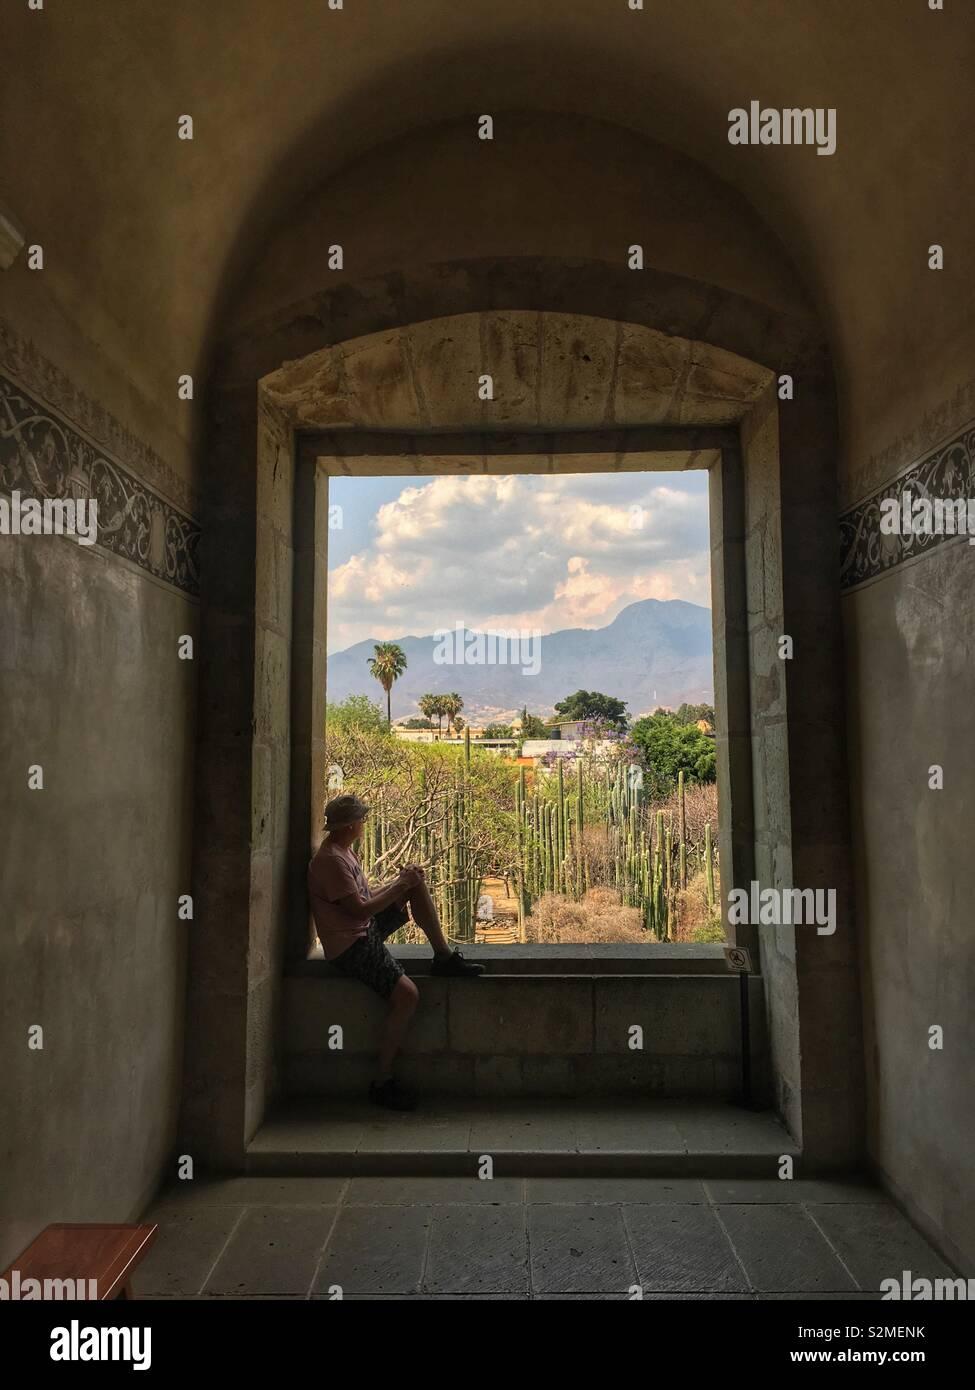 Man resting in window overlooking gardens of Museum of Cultures of Oaxaca, Santo Domingo, Oaxaca City, Oaxaca, Mexico - Stock Image